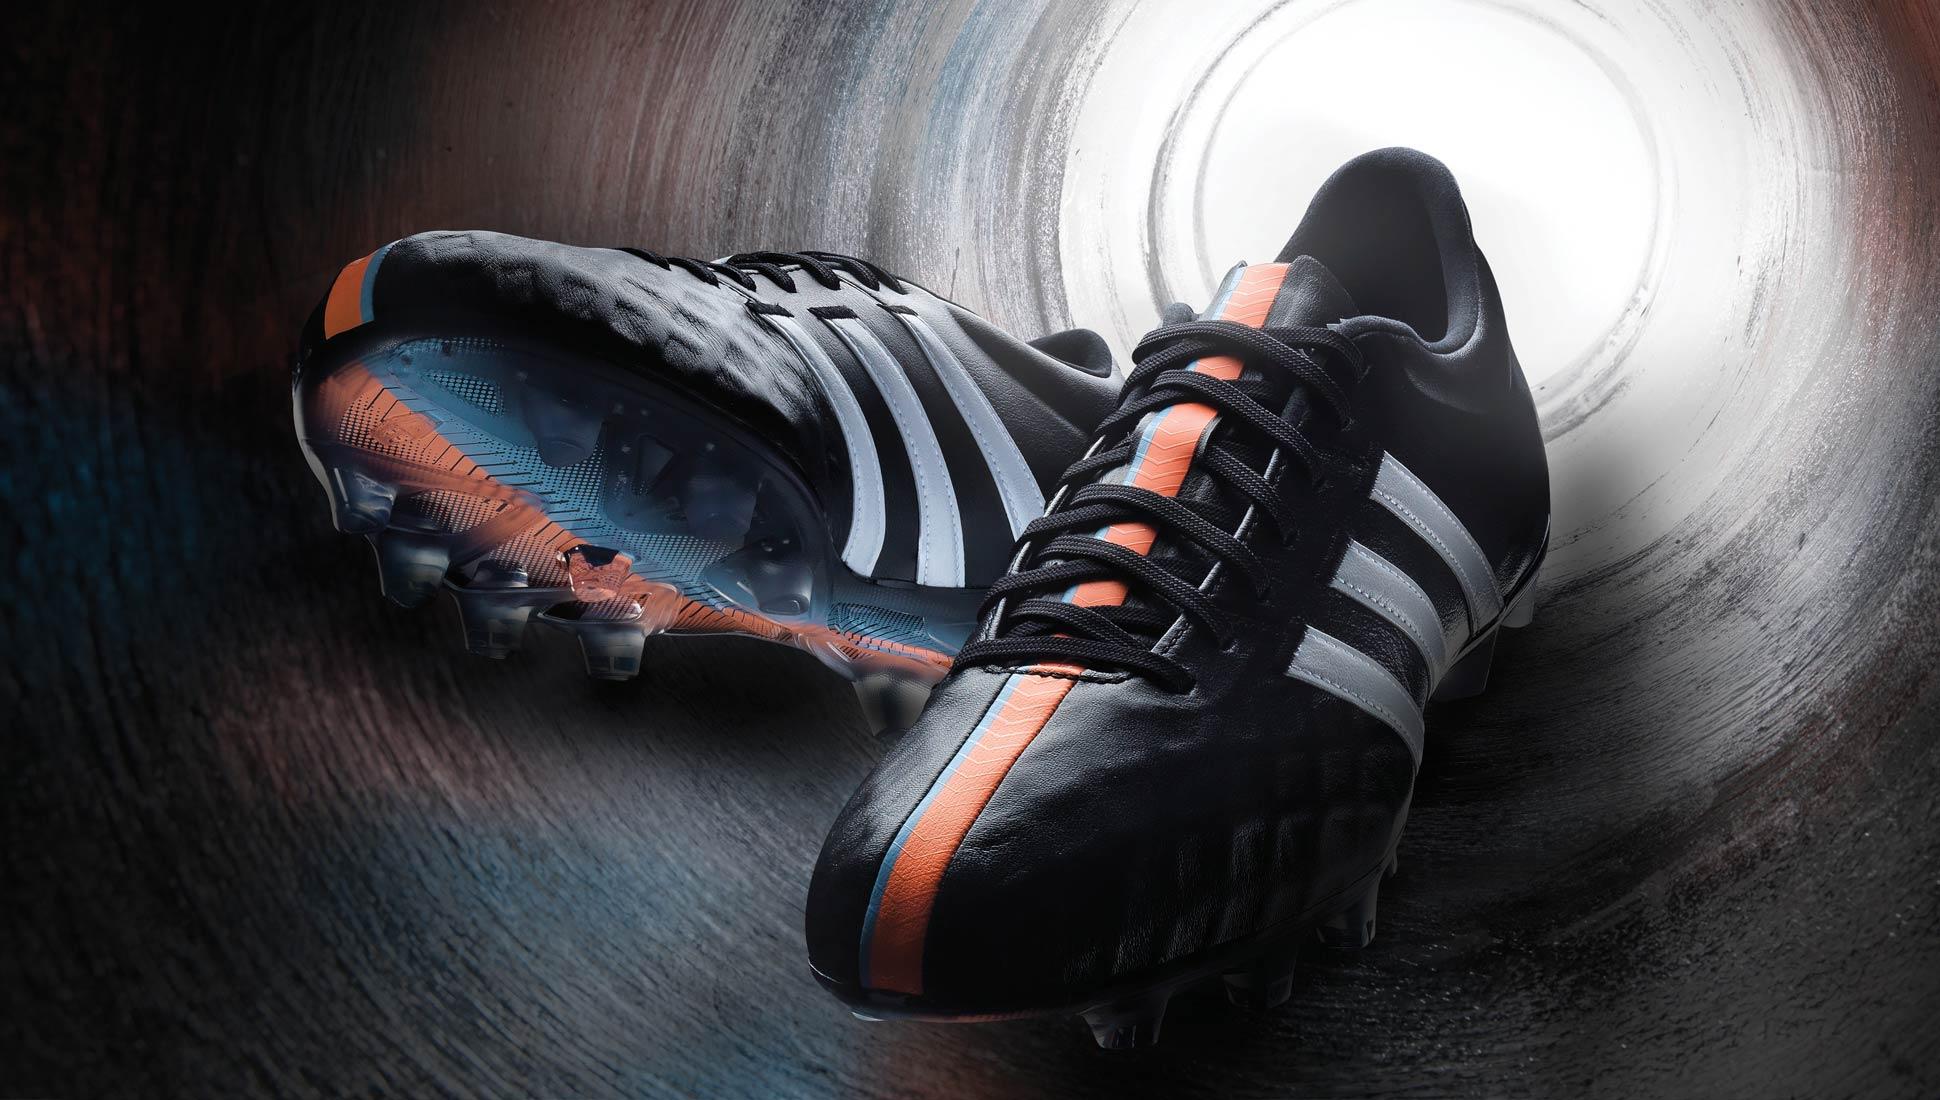 adidas 11 pro all black